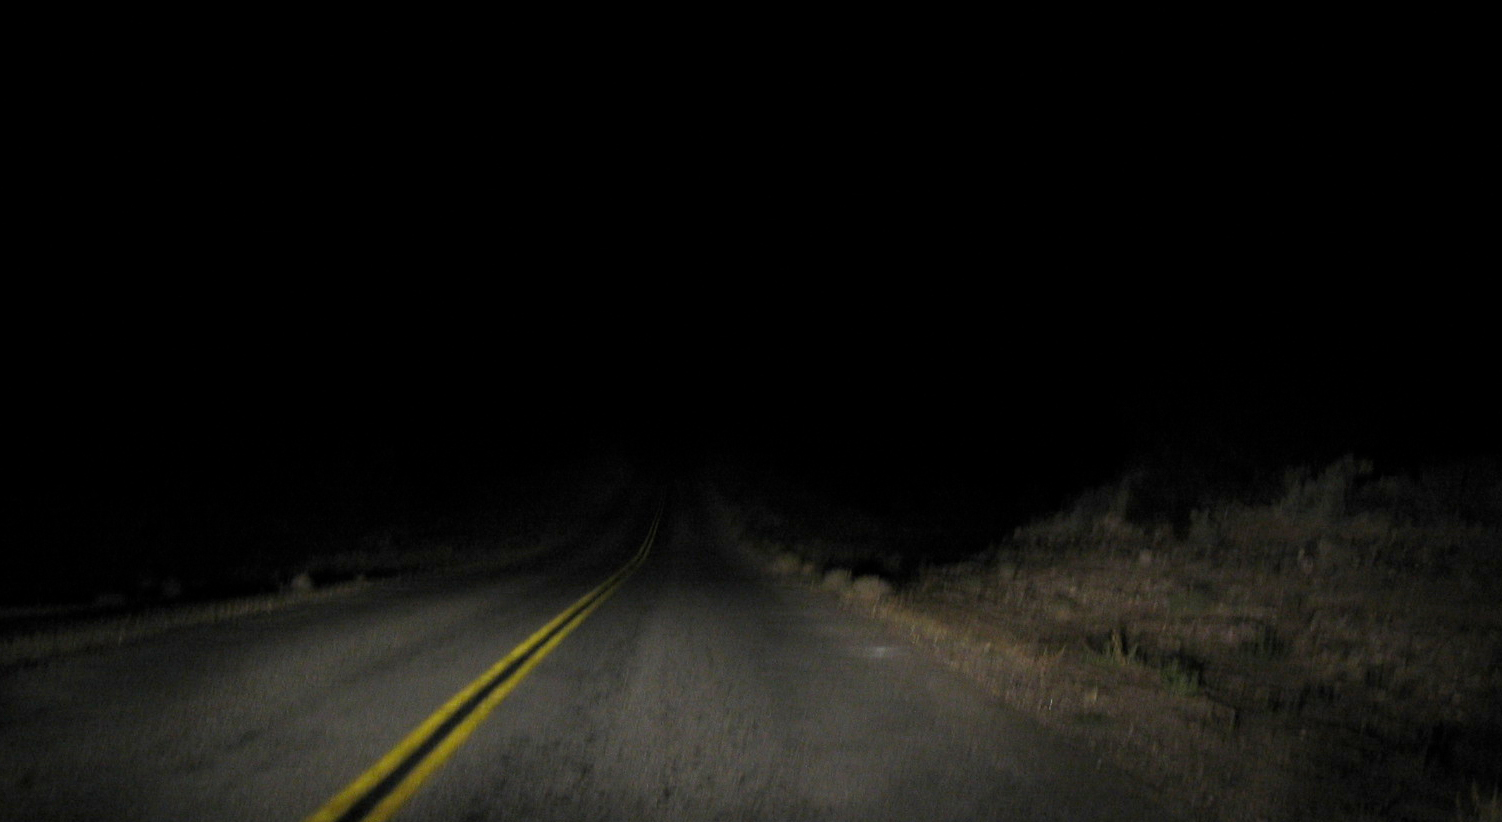 nightDriving.jpg